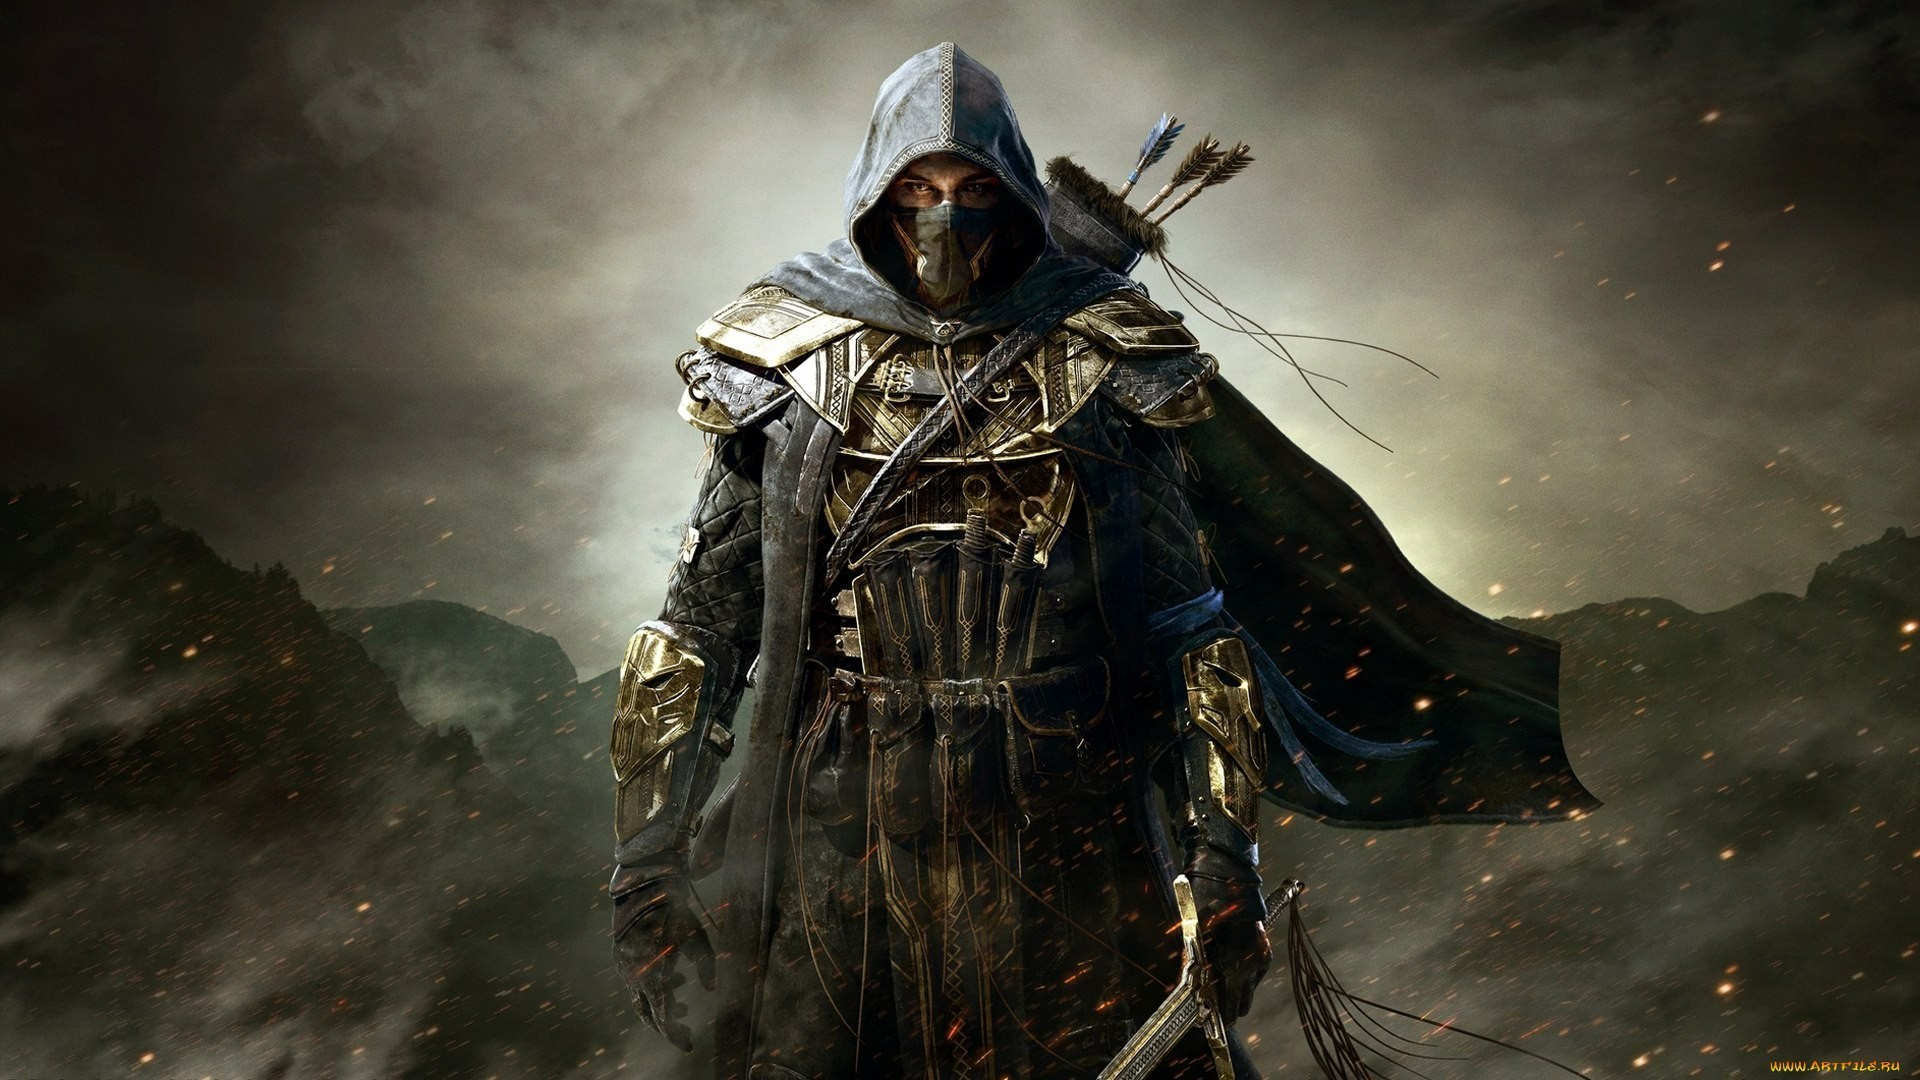 154 The Elder Scrolls Online HD Wallpapers | Backgrounds – Wallpaper Abyss